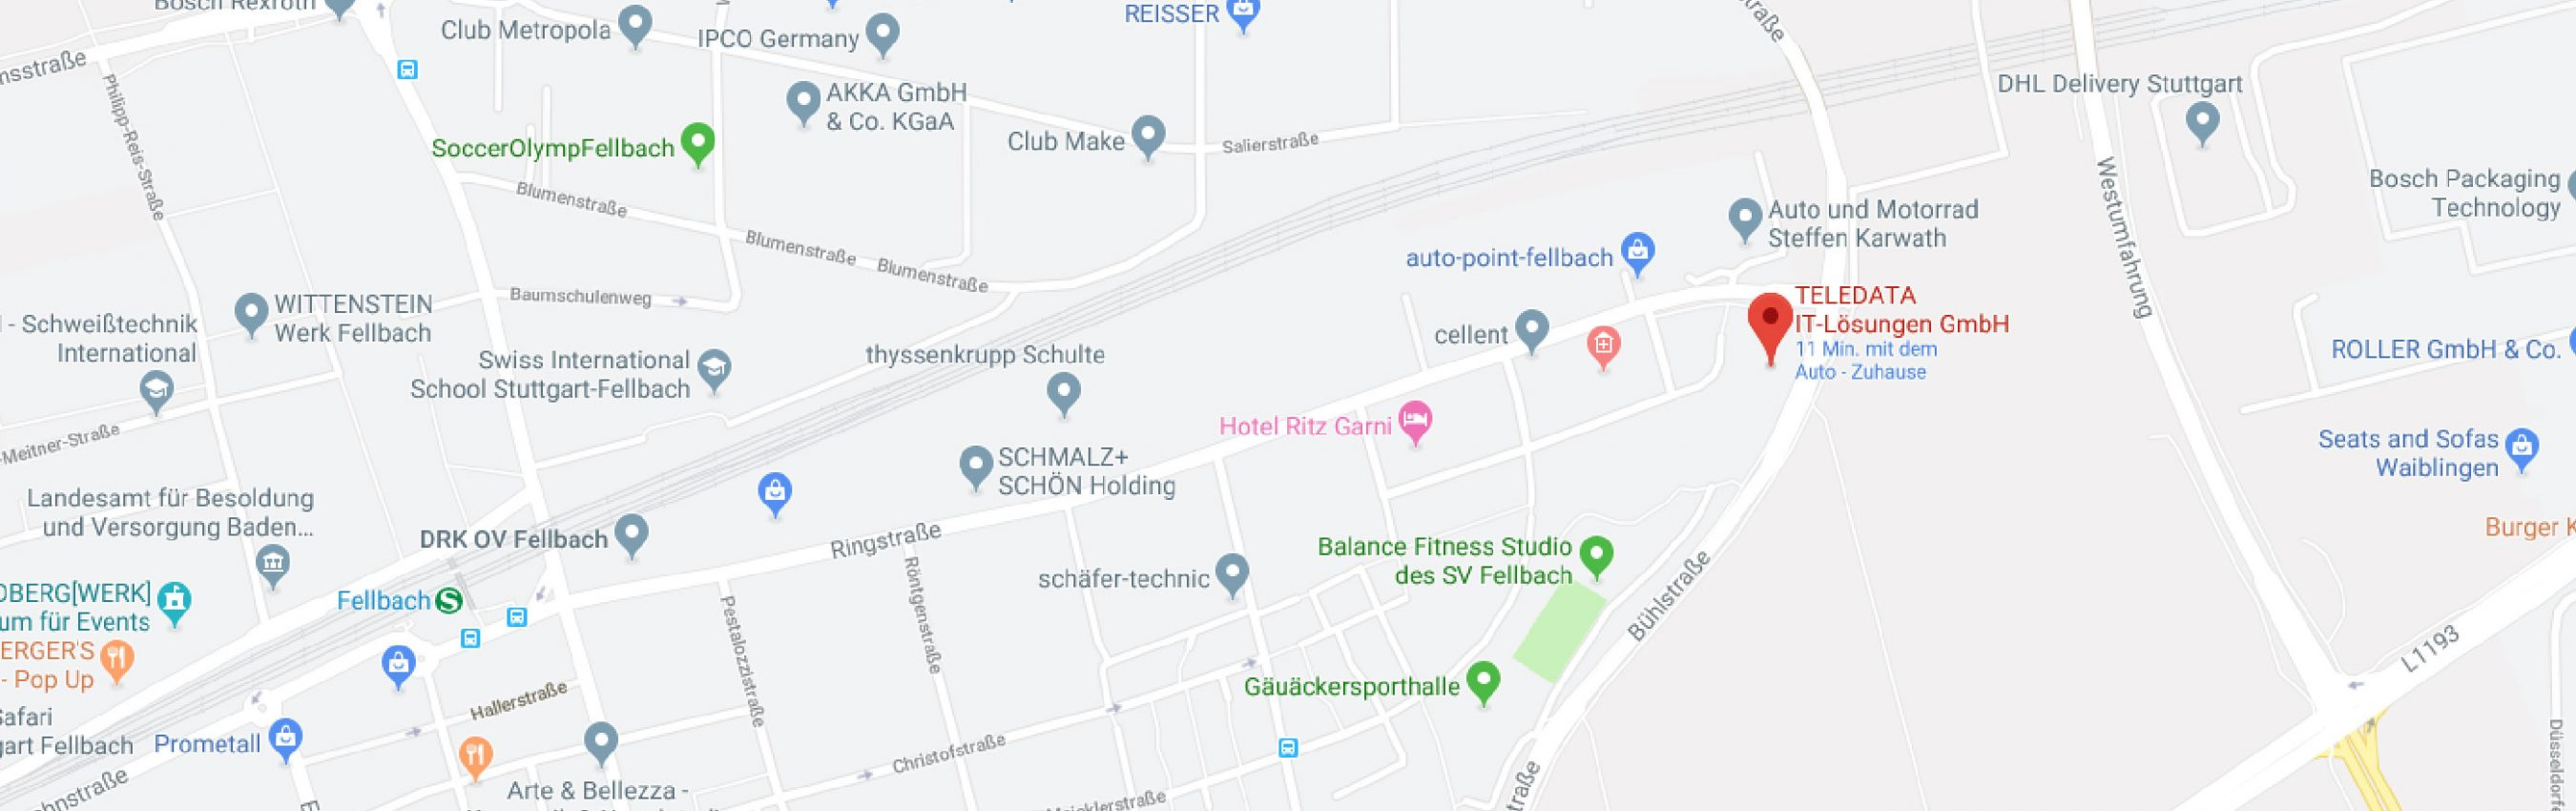 teledata_map